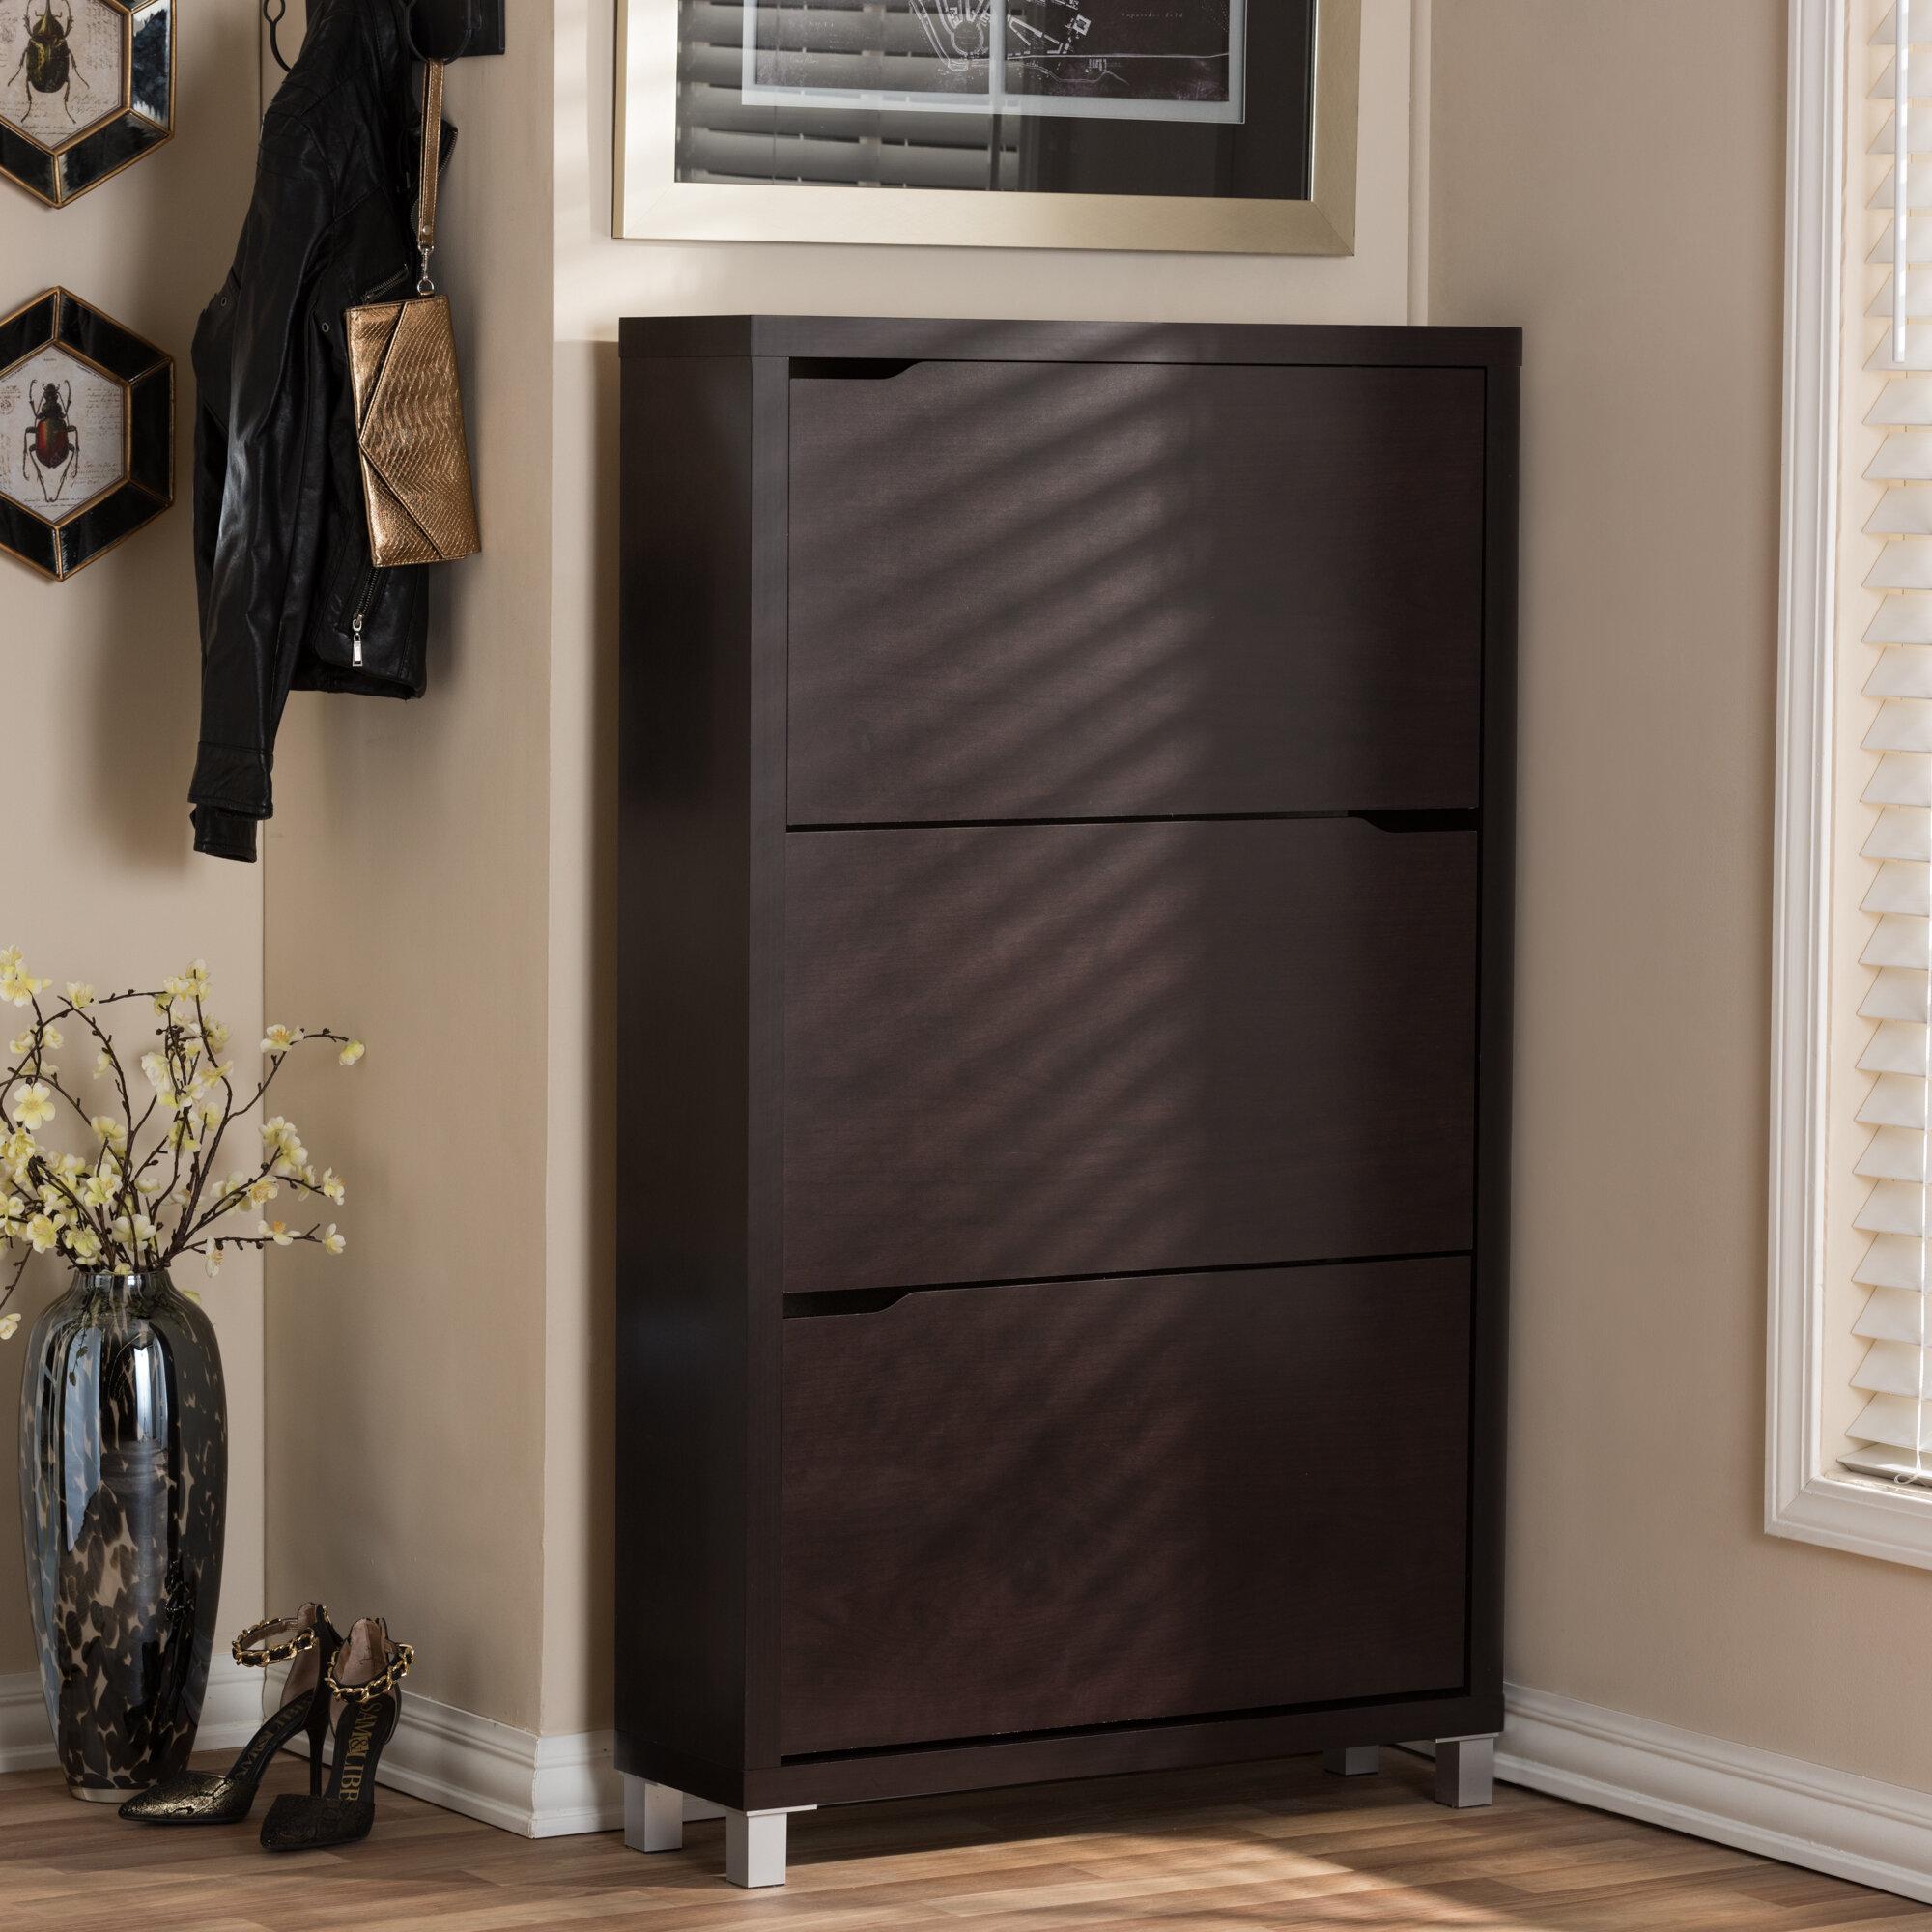 Latitude Run 18 Pair Wood Shoe Storage Cabinet U0026 Reviews | Wayfair